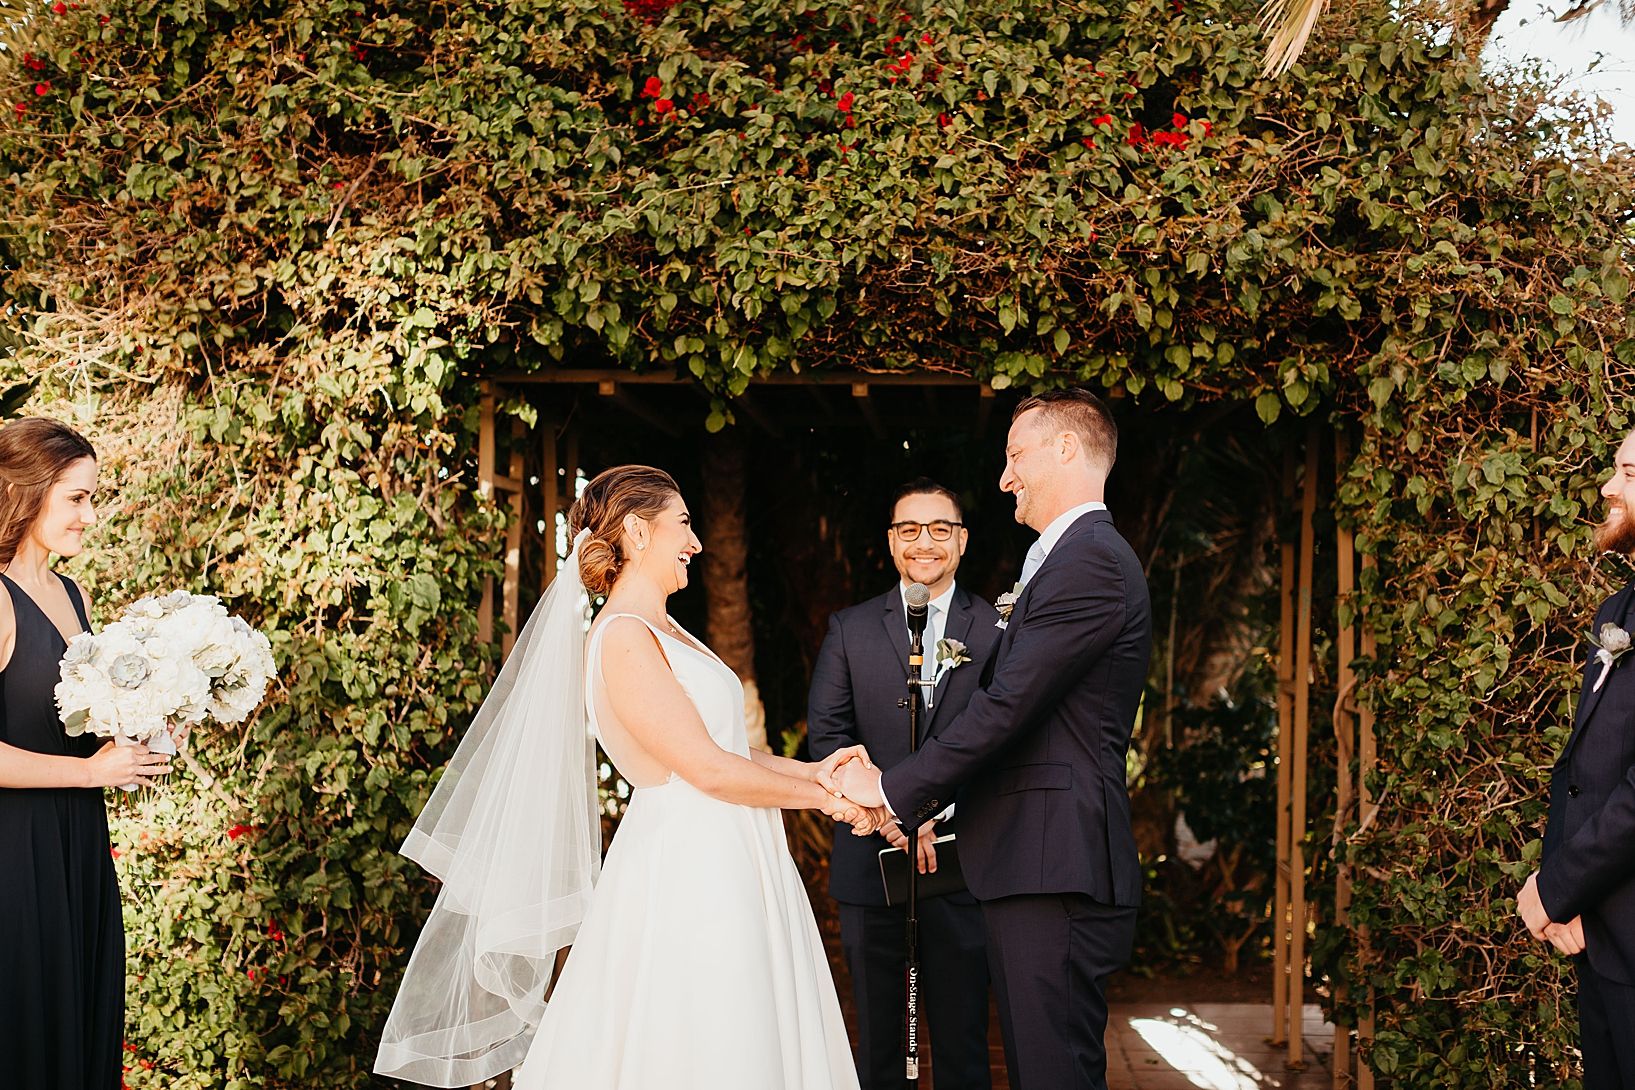 Herb-and-Wood-Wedding-42.jpg